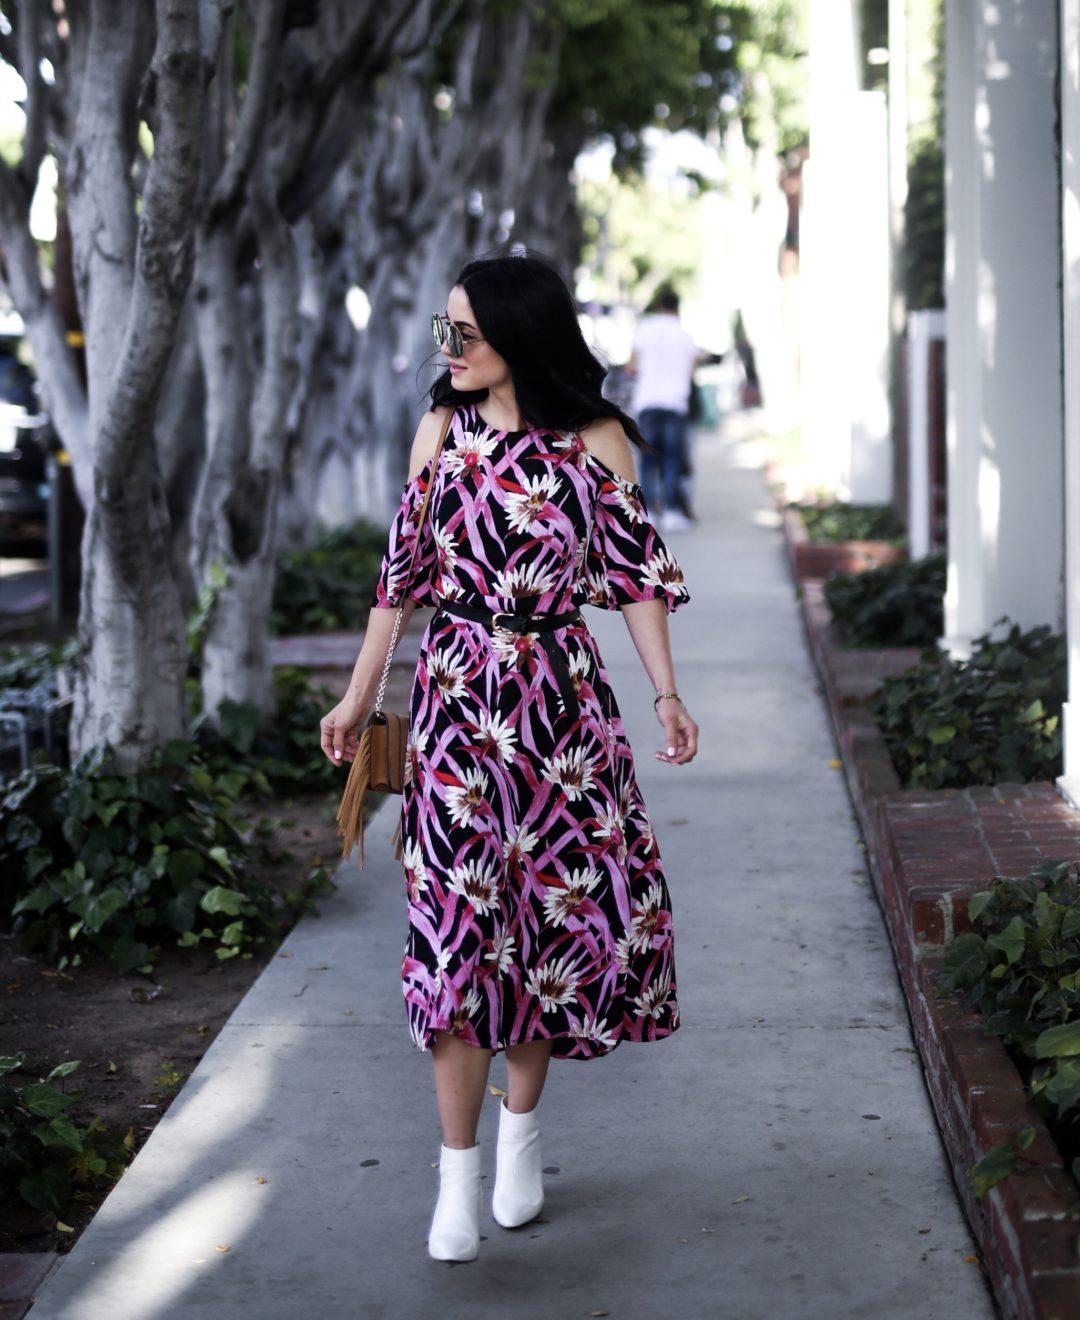 Festival-fashion-coachella-whowhatwear